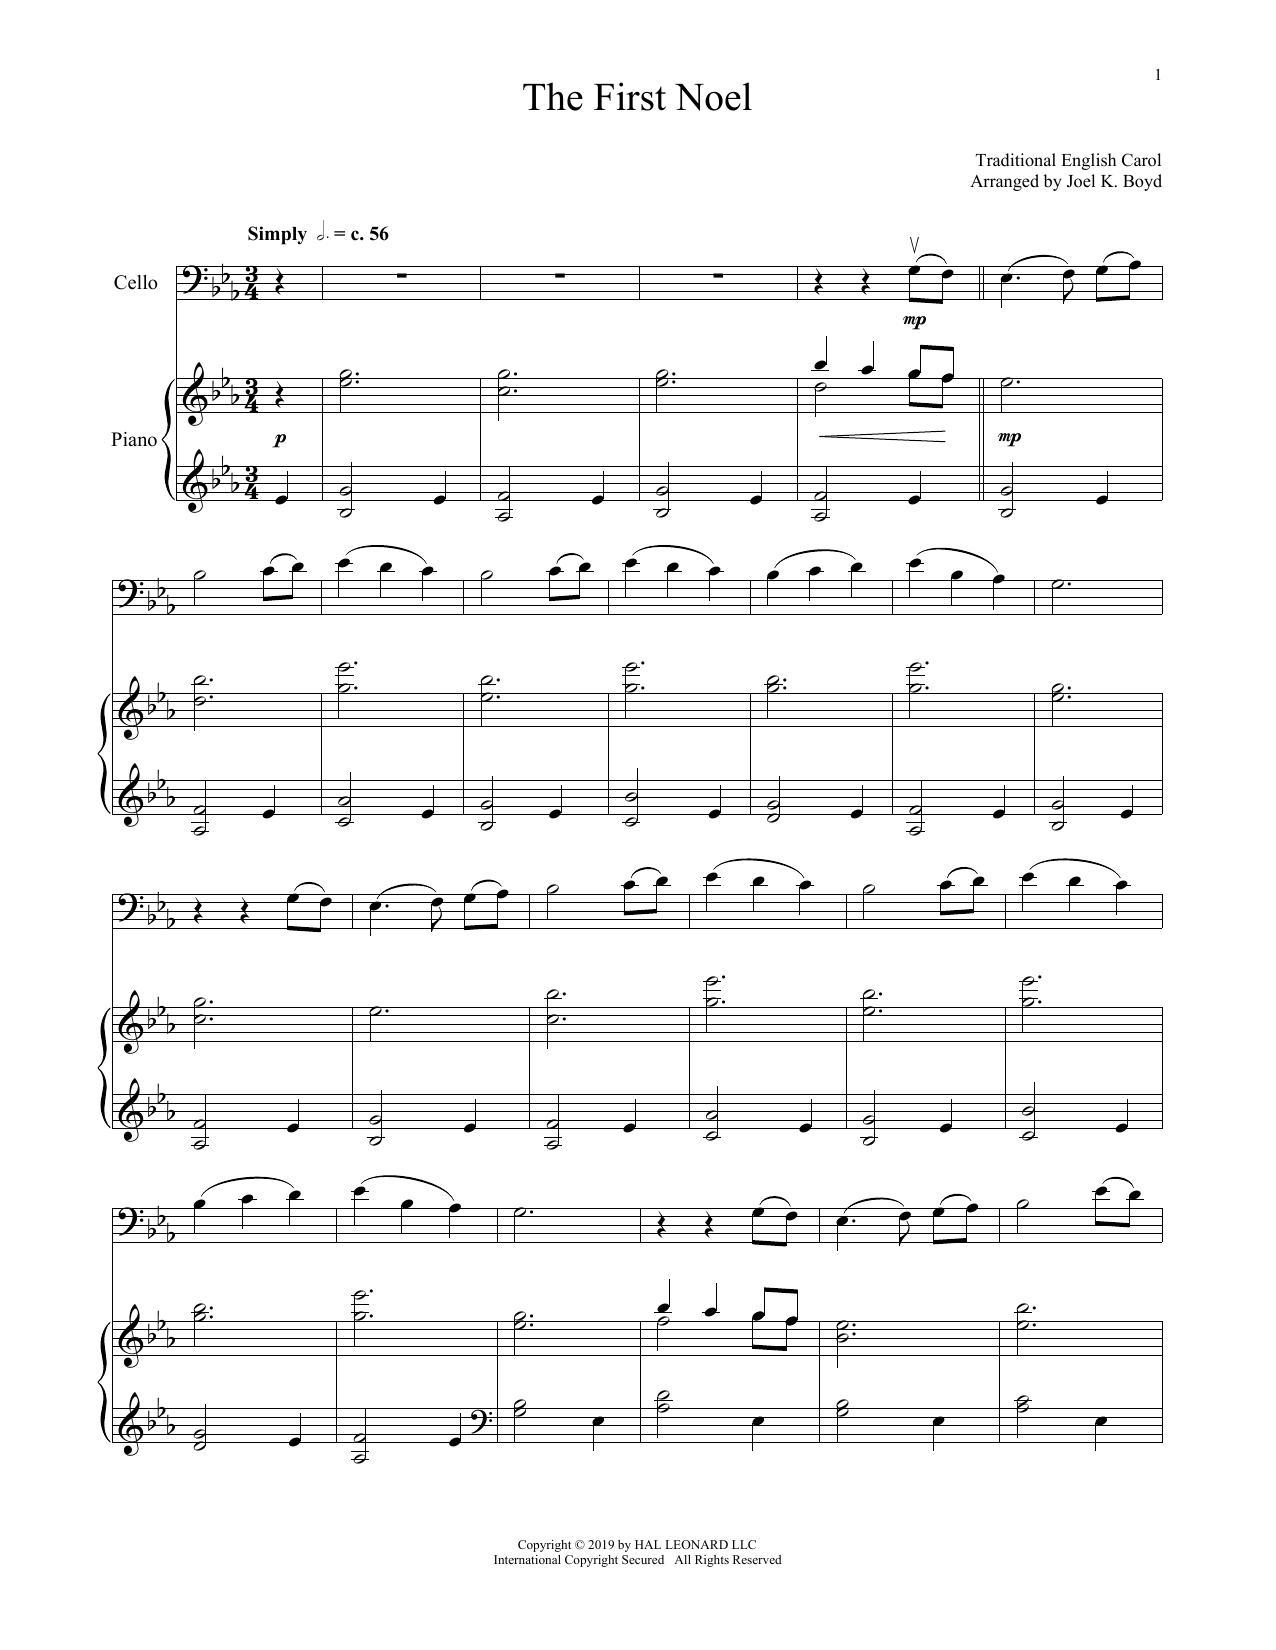 W Sandys Christmas Carols The First Noel Sheet Music Download Pdf Score 177878